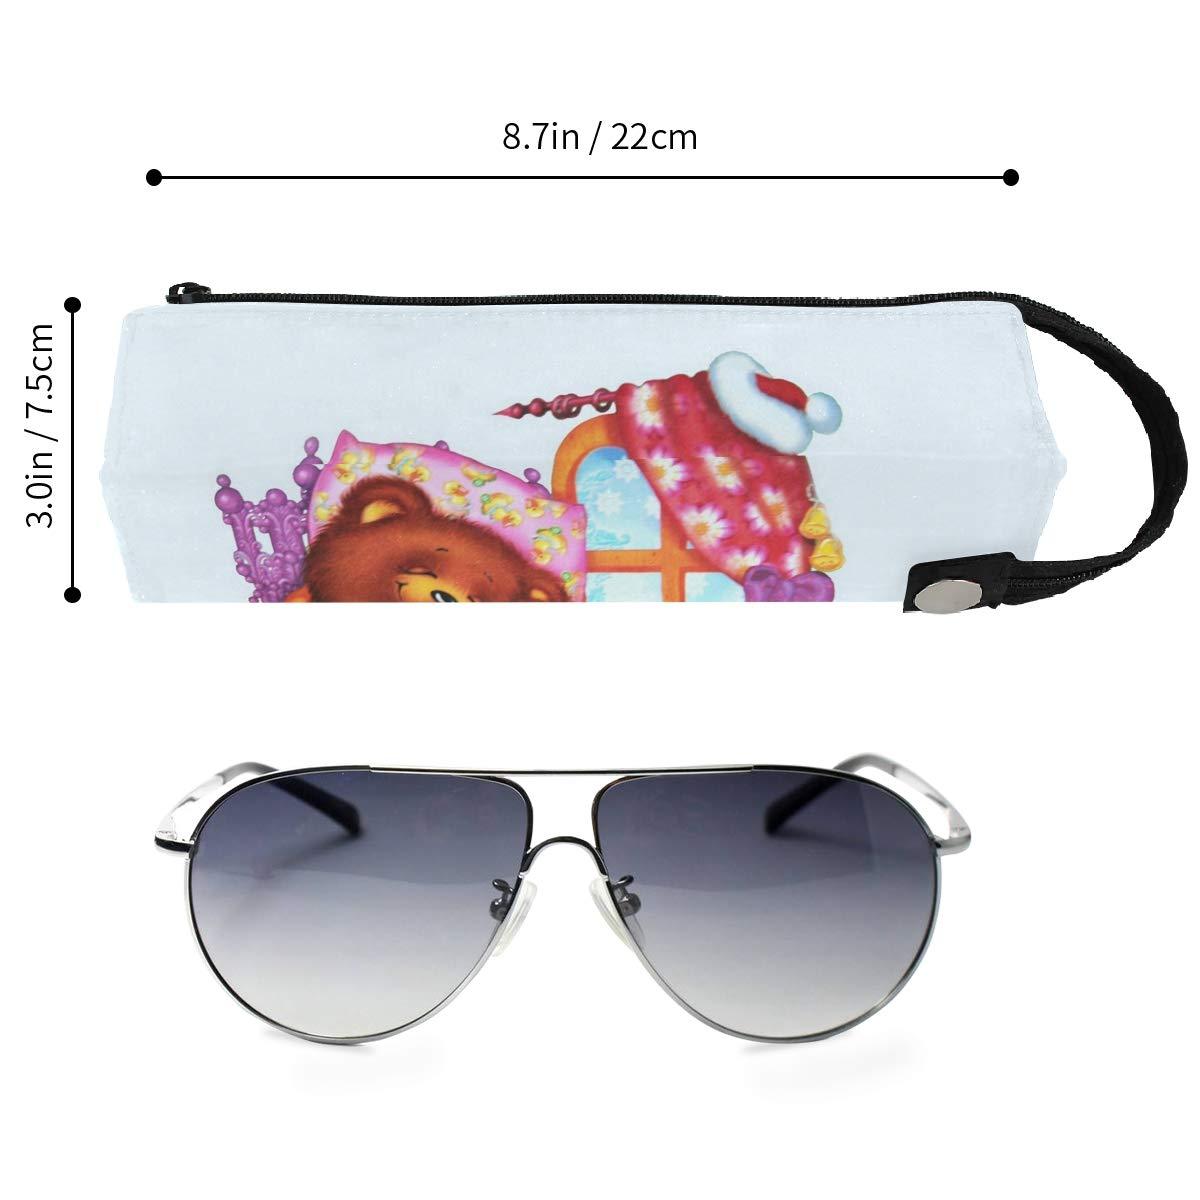 Underwater Sea Ocean Tropical Fish Glasses Case Portable Soft Sunglasses Ball Pen Bag Protective Box